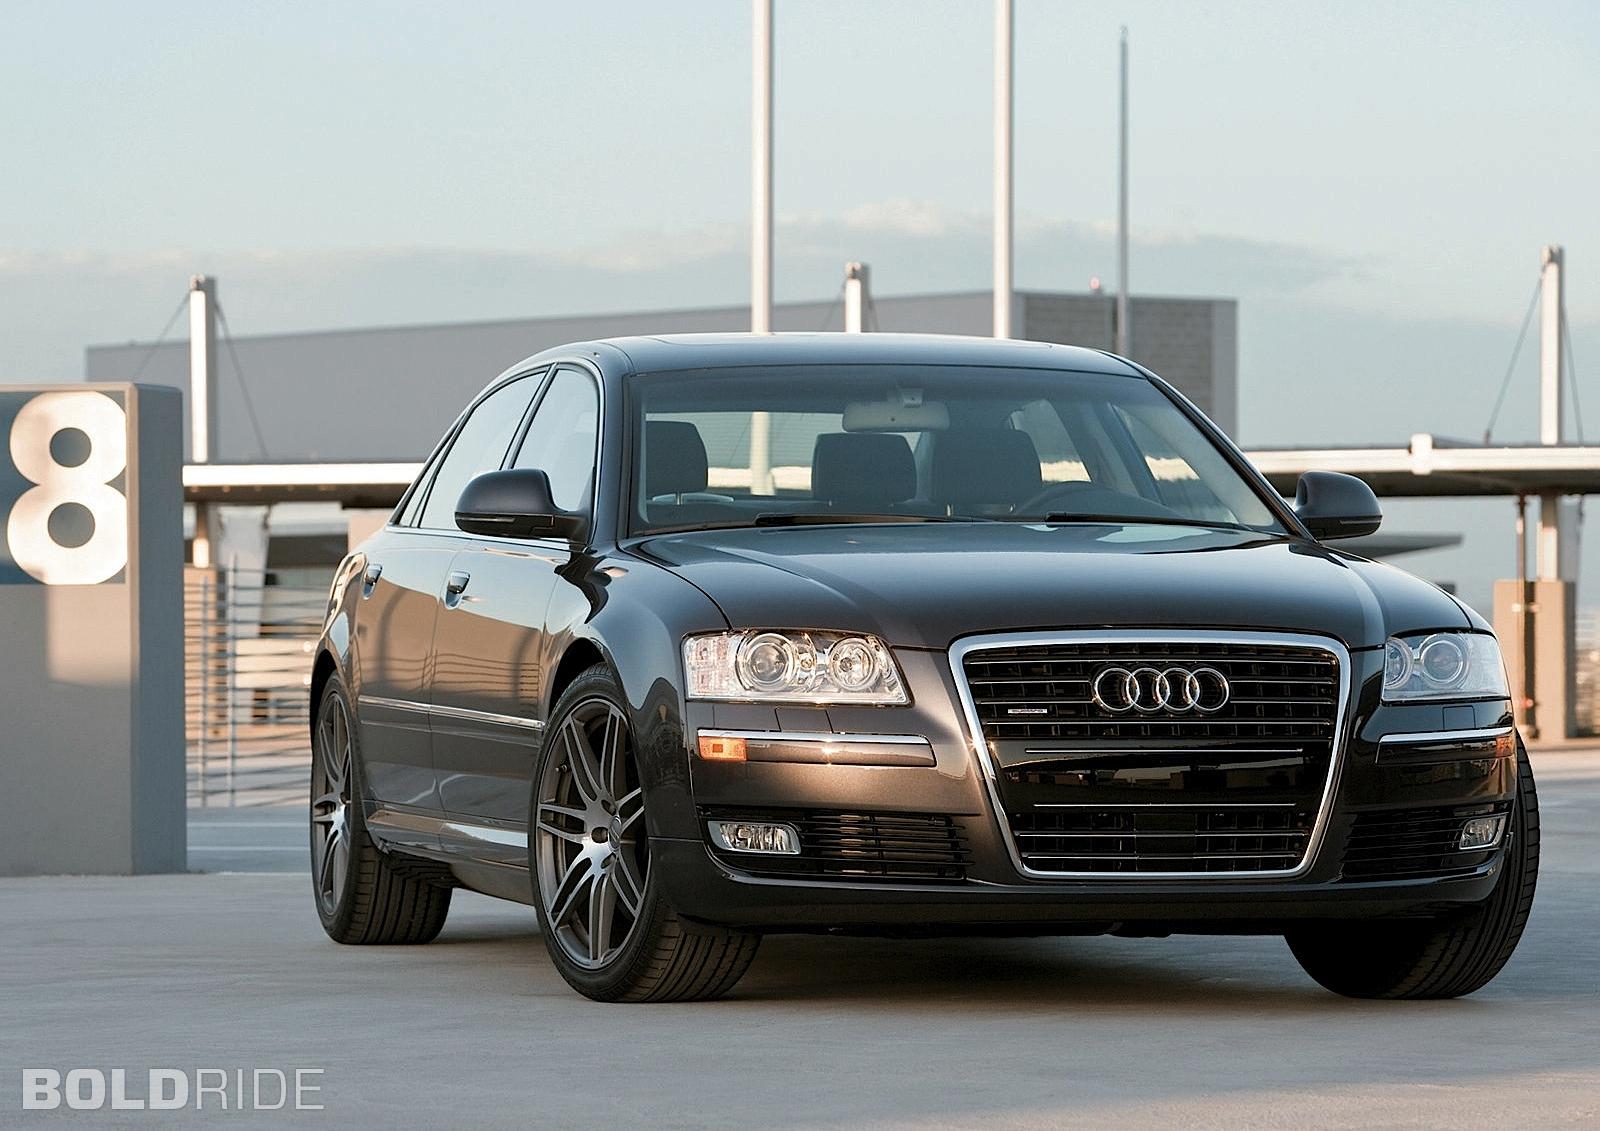 2008 Audi A8 Image 16